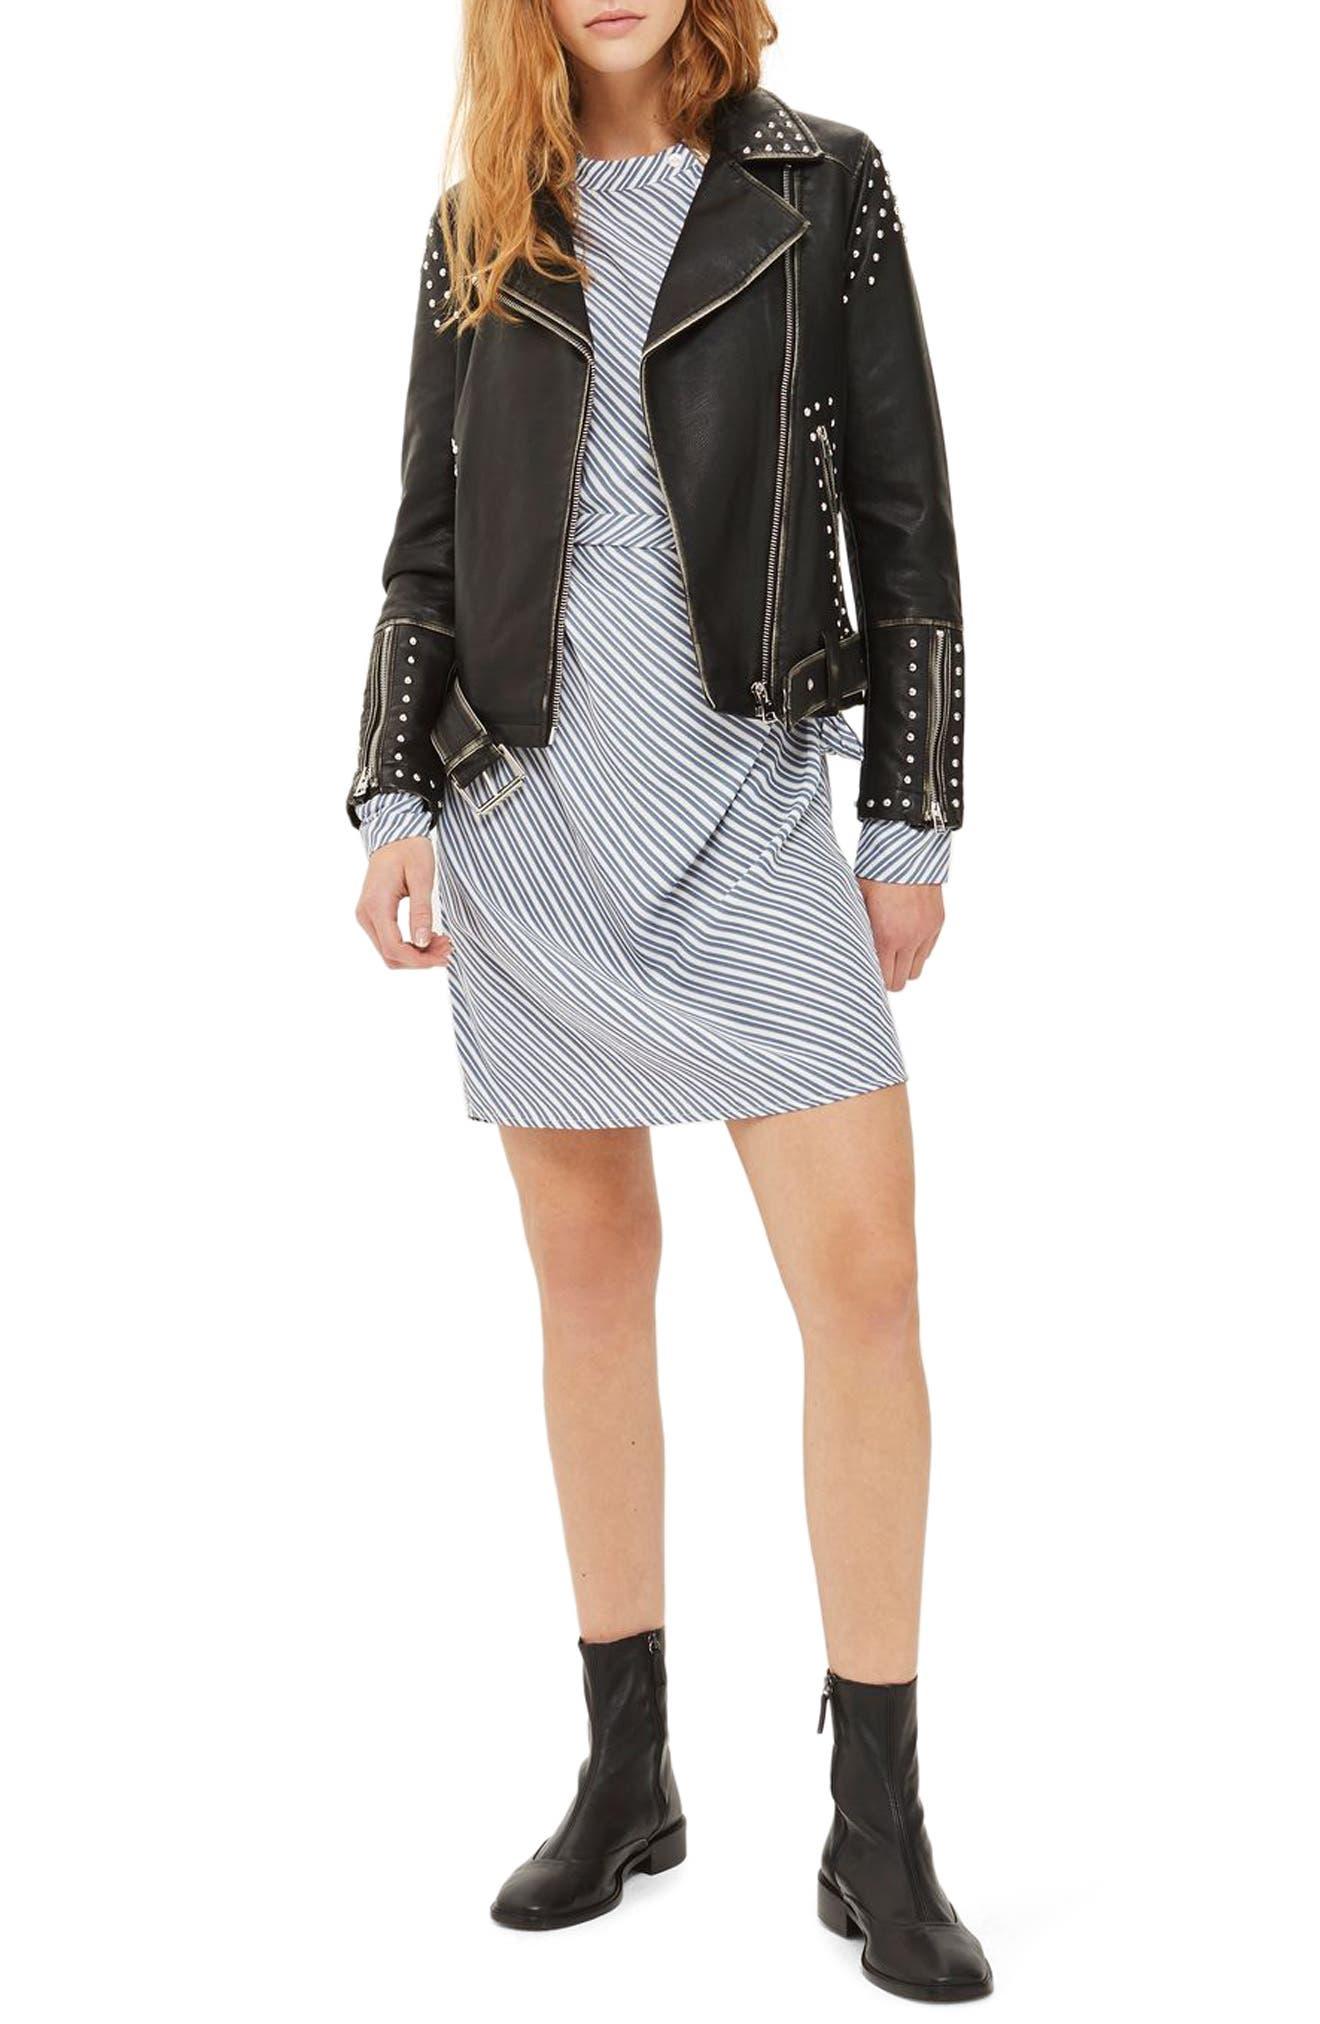 Topshop Naomi Studded Faux Leather Biker Jacket